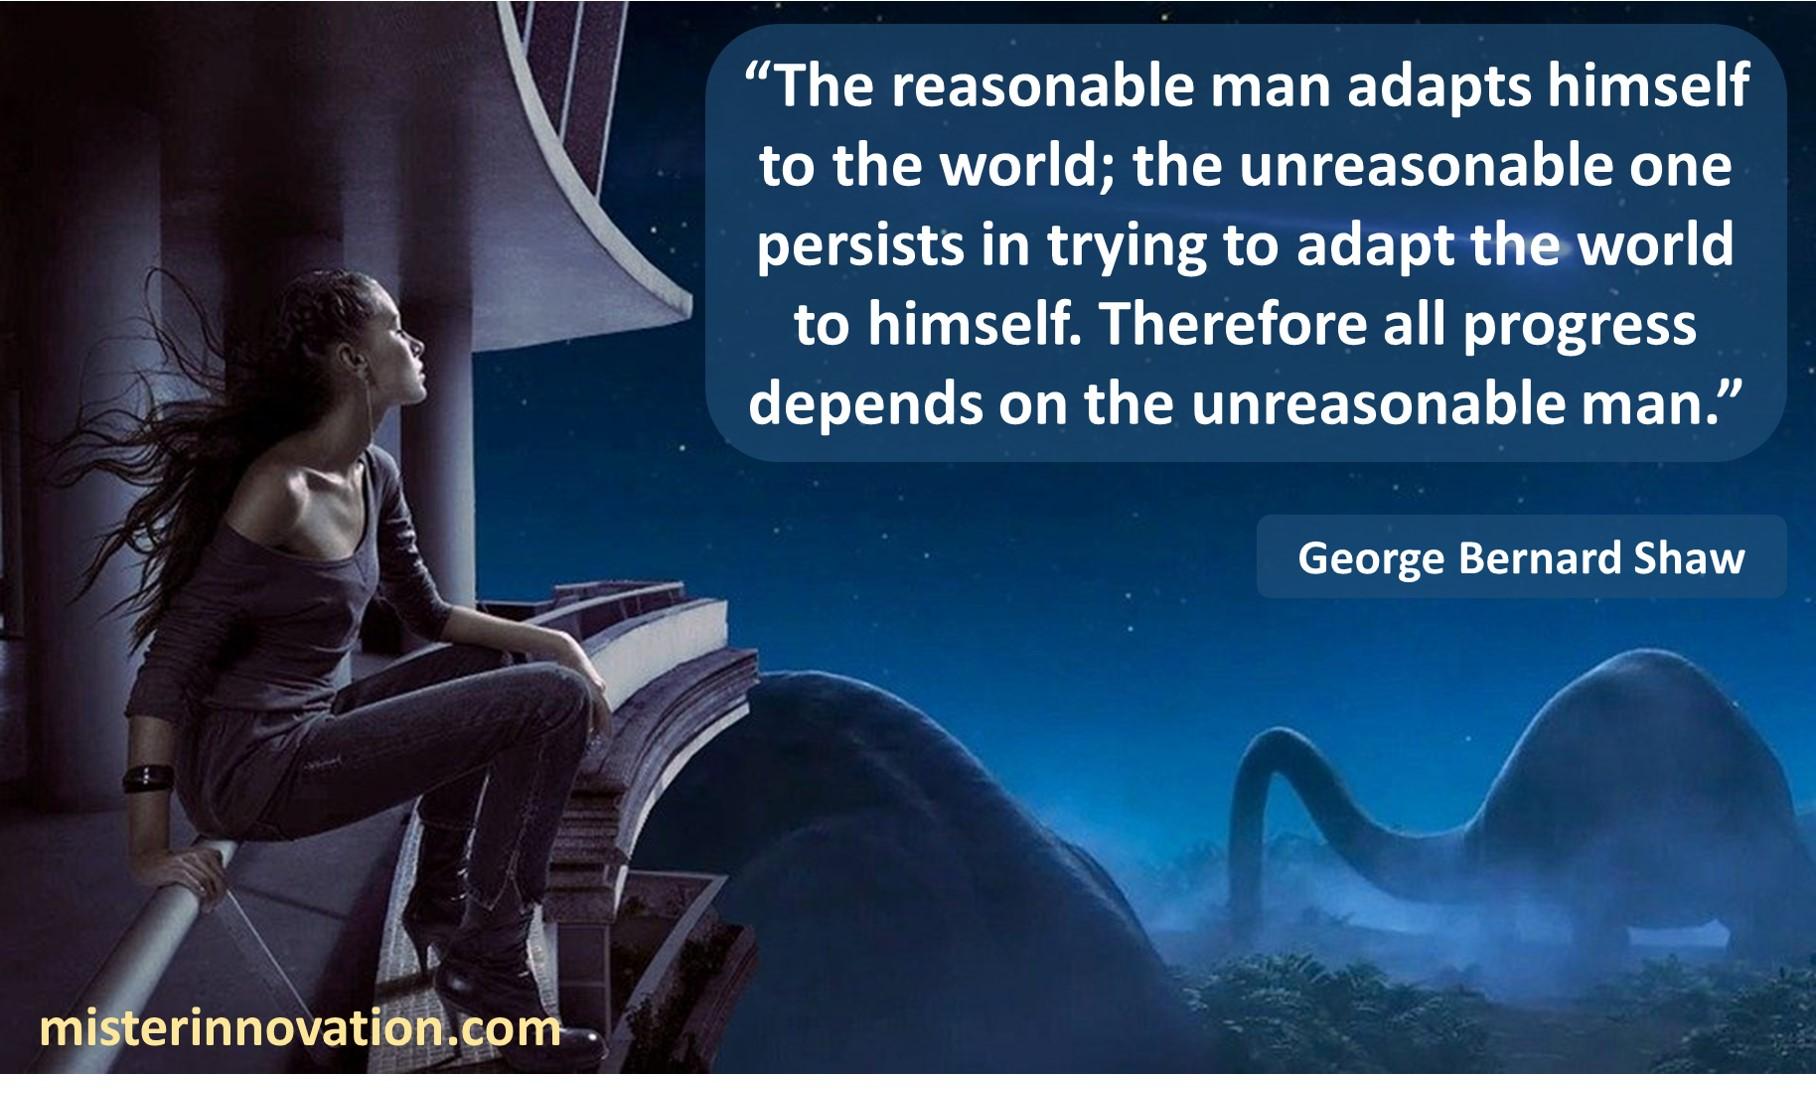 George Bernard Shaw Unreasonable